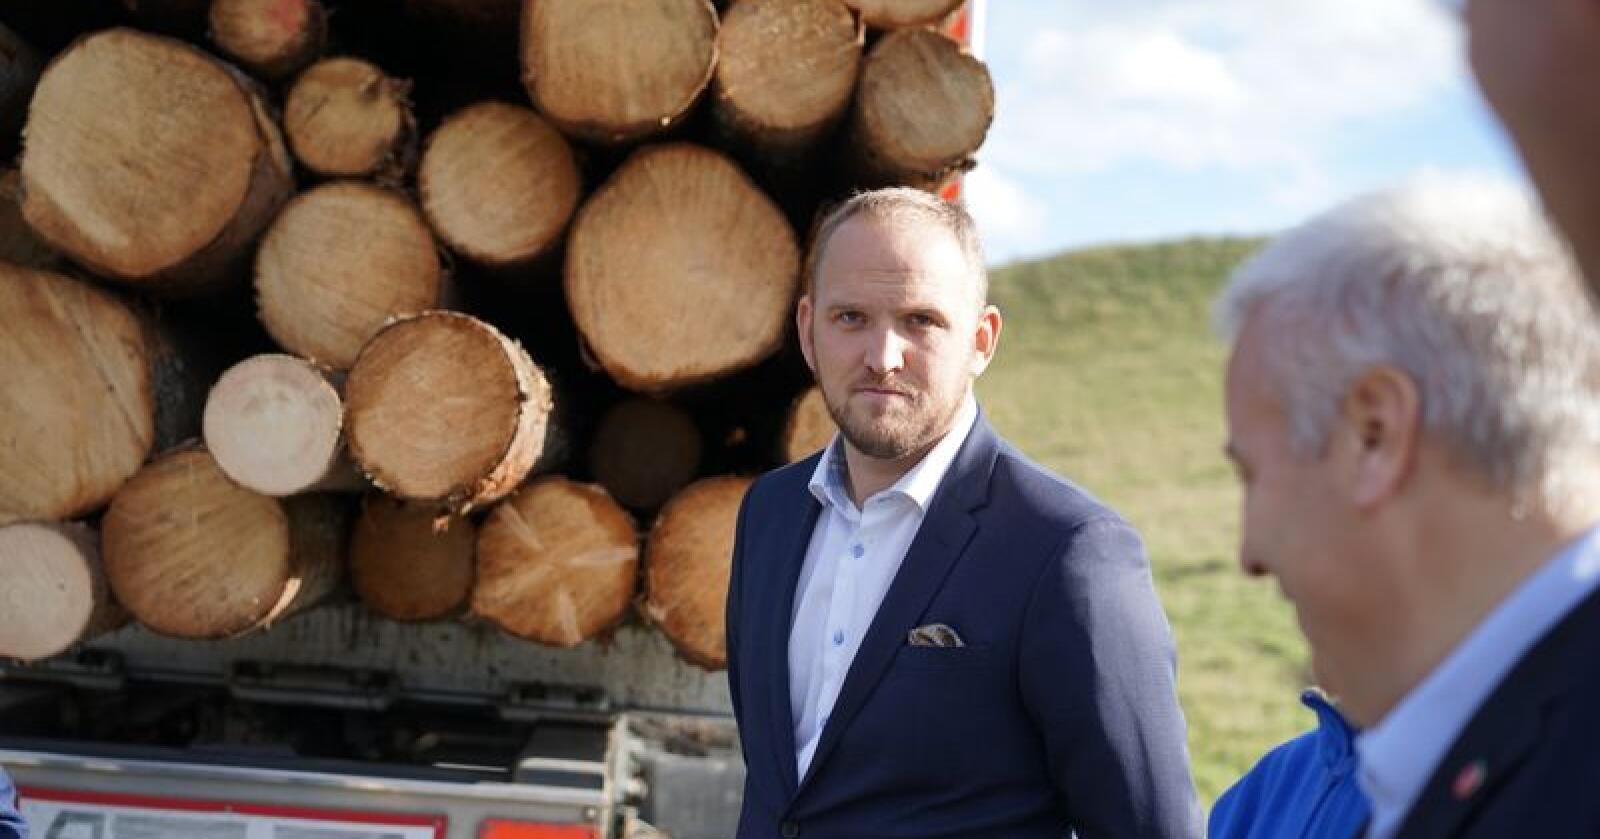 Samferdselsminister Jon Georg Dale (Frp) kårar samferdsledepartementet til budsjettvinnarar for 2020. Foto: Benjamin Hernes Vogl